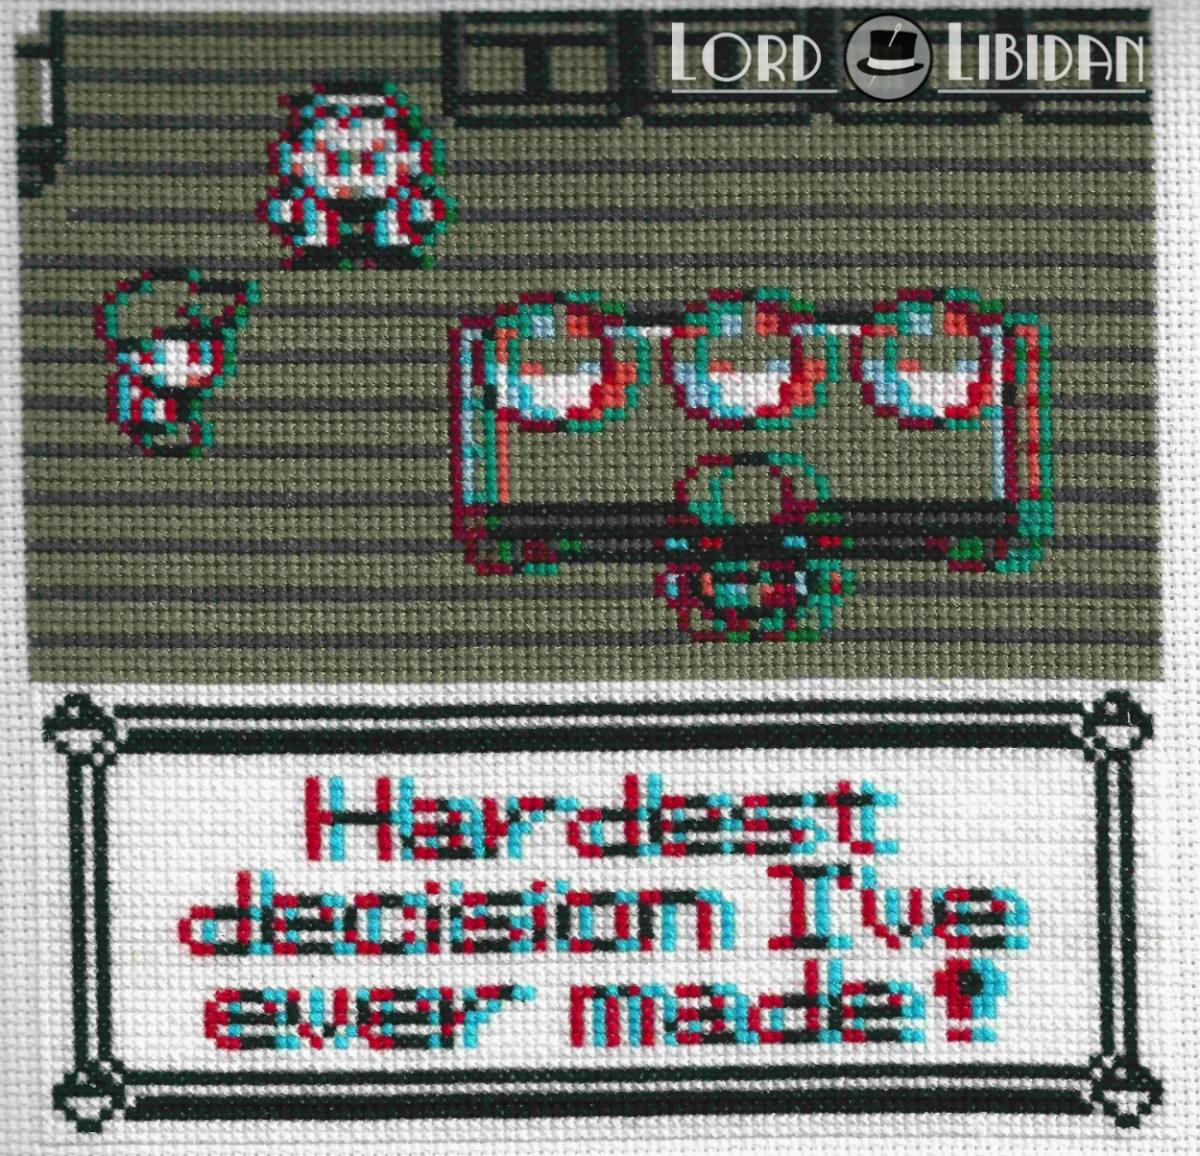 Lord Libidan – Sprite Stitch Best Bits